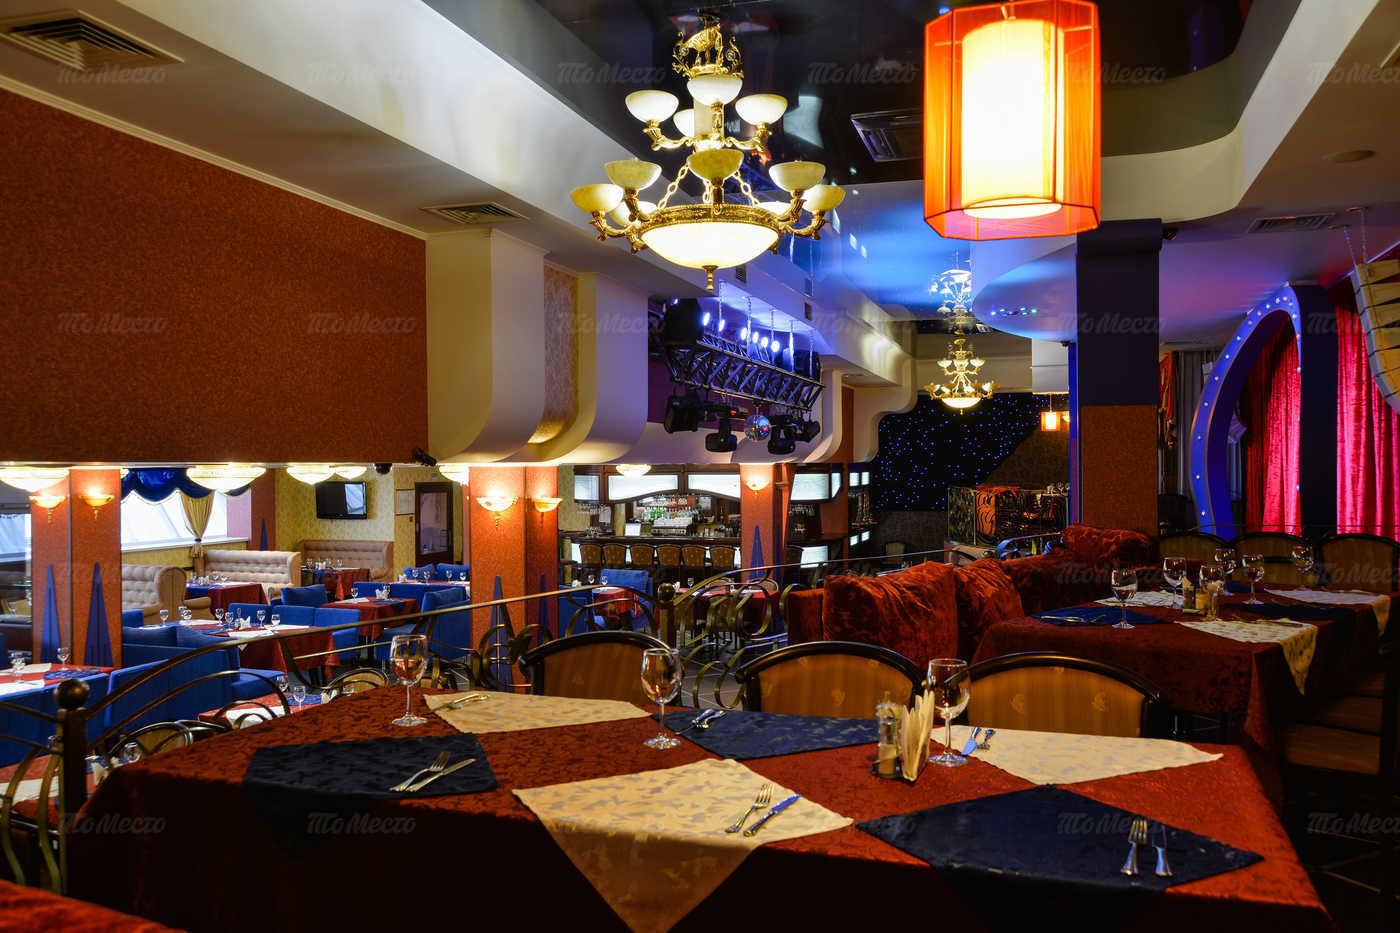 Меню кафе, ресторана Пьер на улице Конева